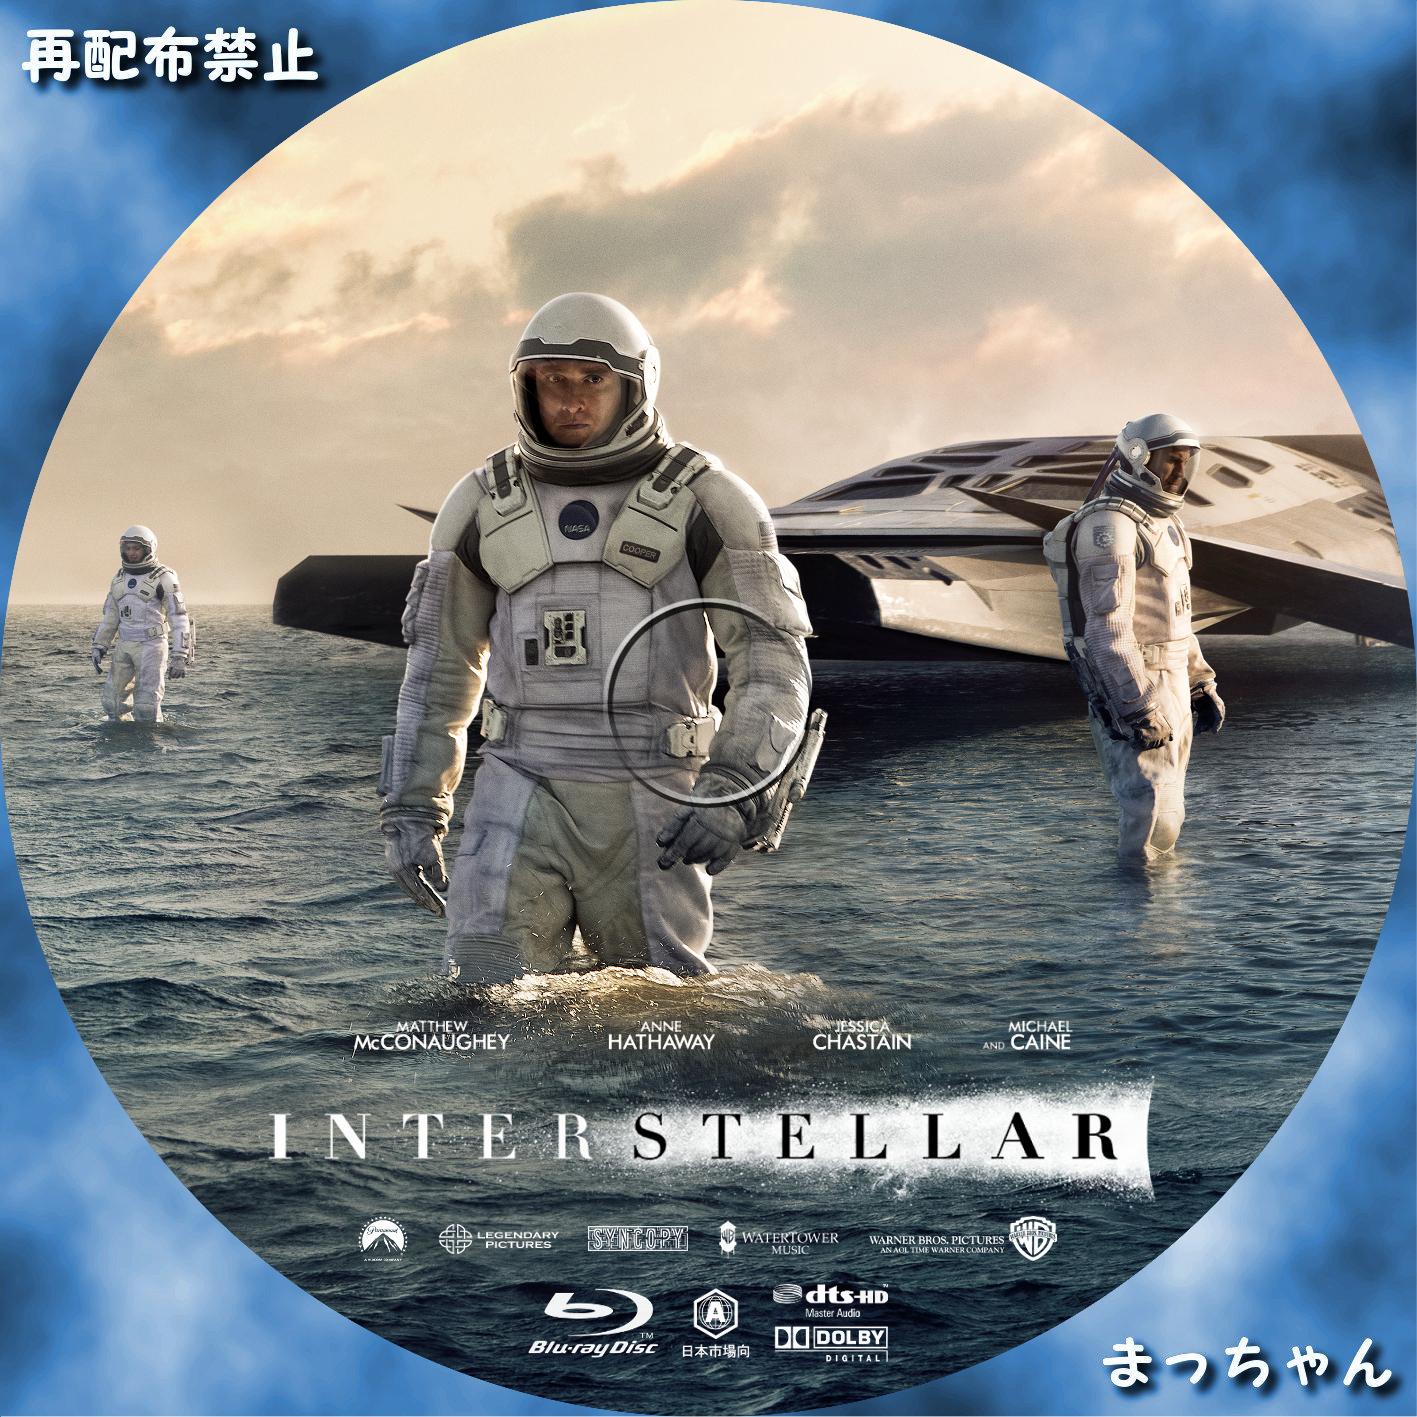 Interstellar Movie : 無料カレンダー 2015年 : カレンダー